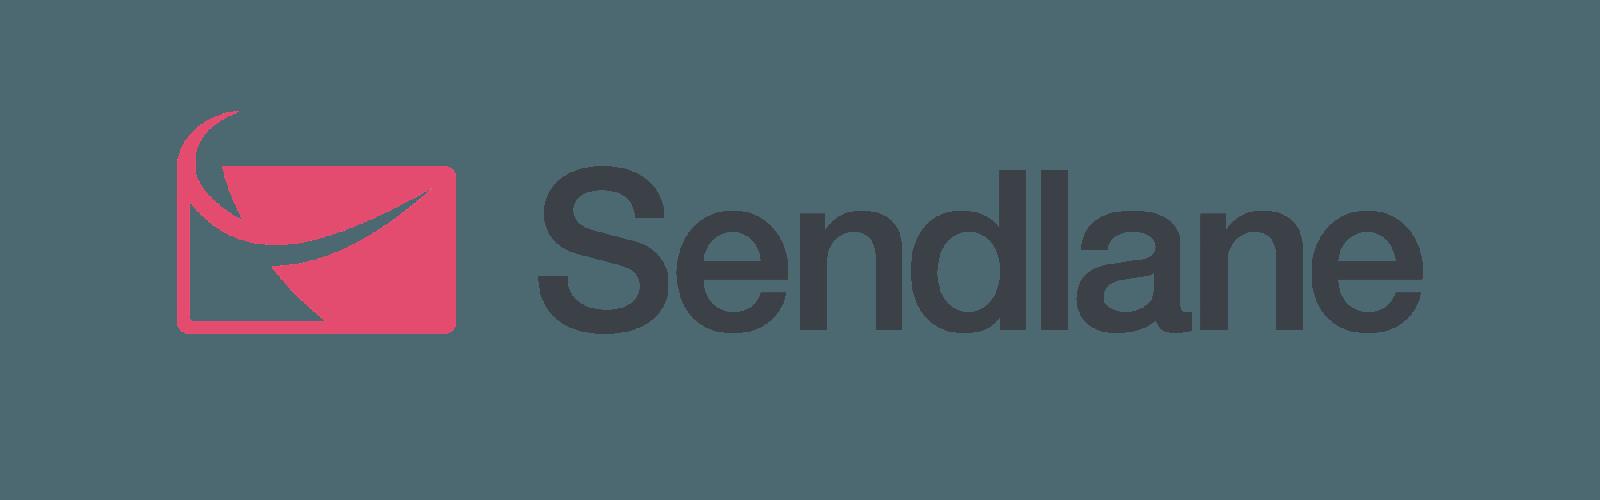 sendland logo